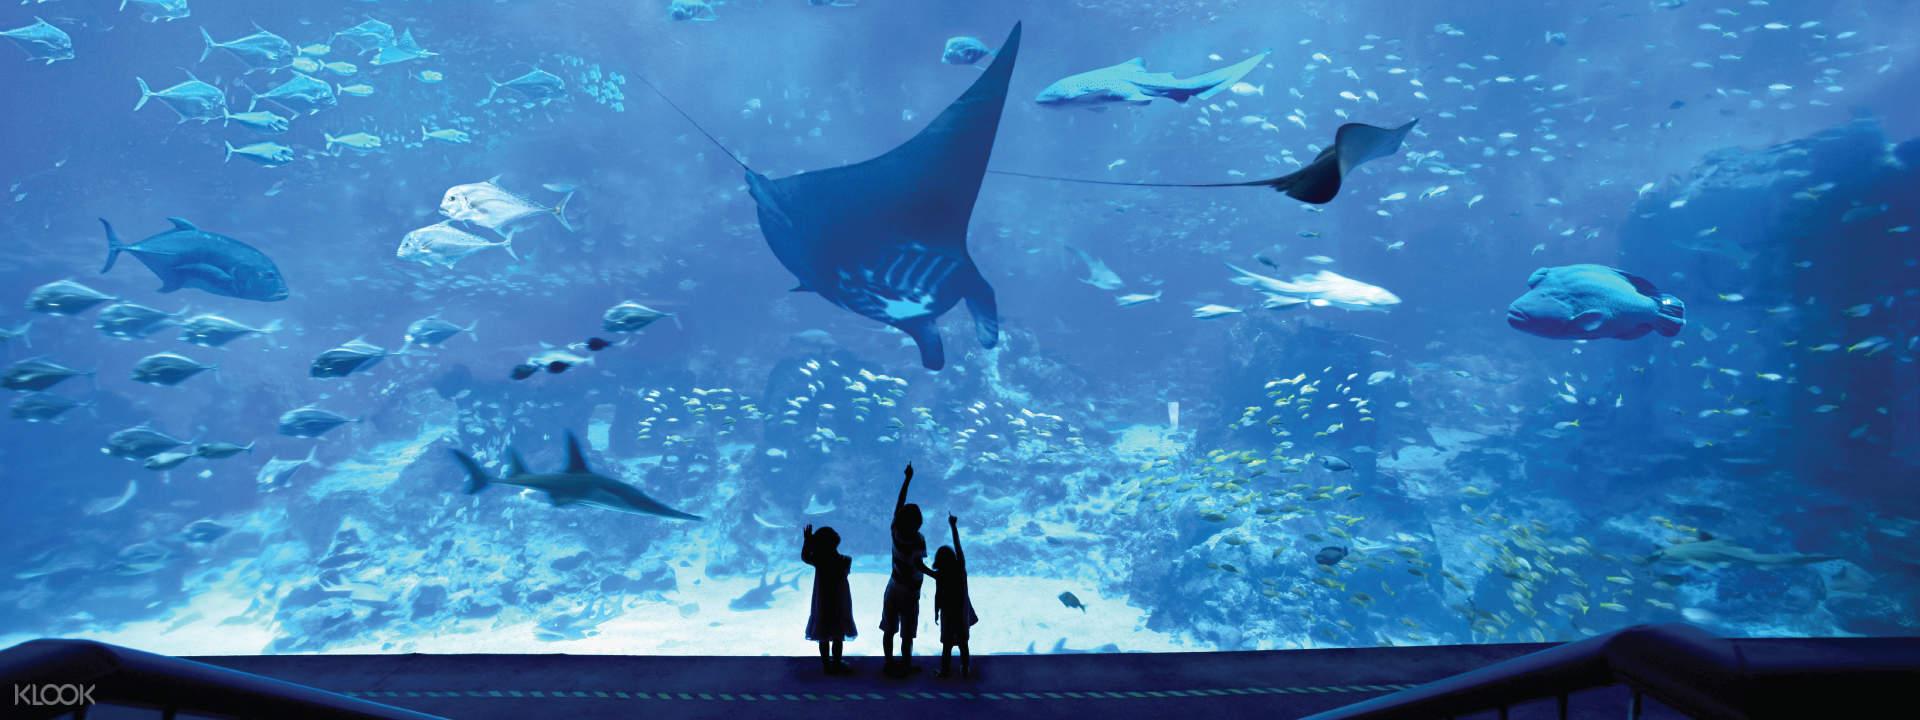 S.E.A. Aquarium Ticket Sentosa, Singapore - Klook